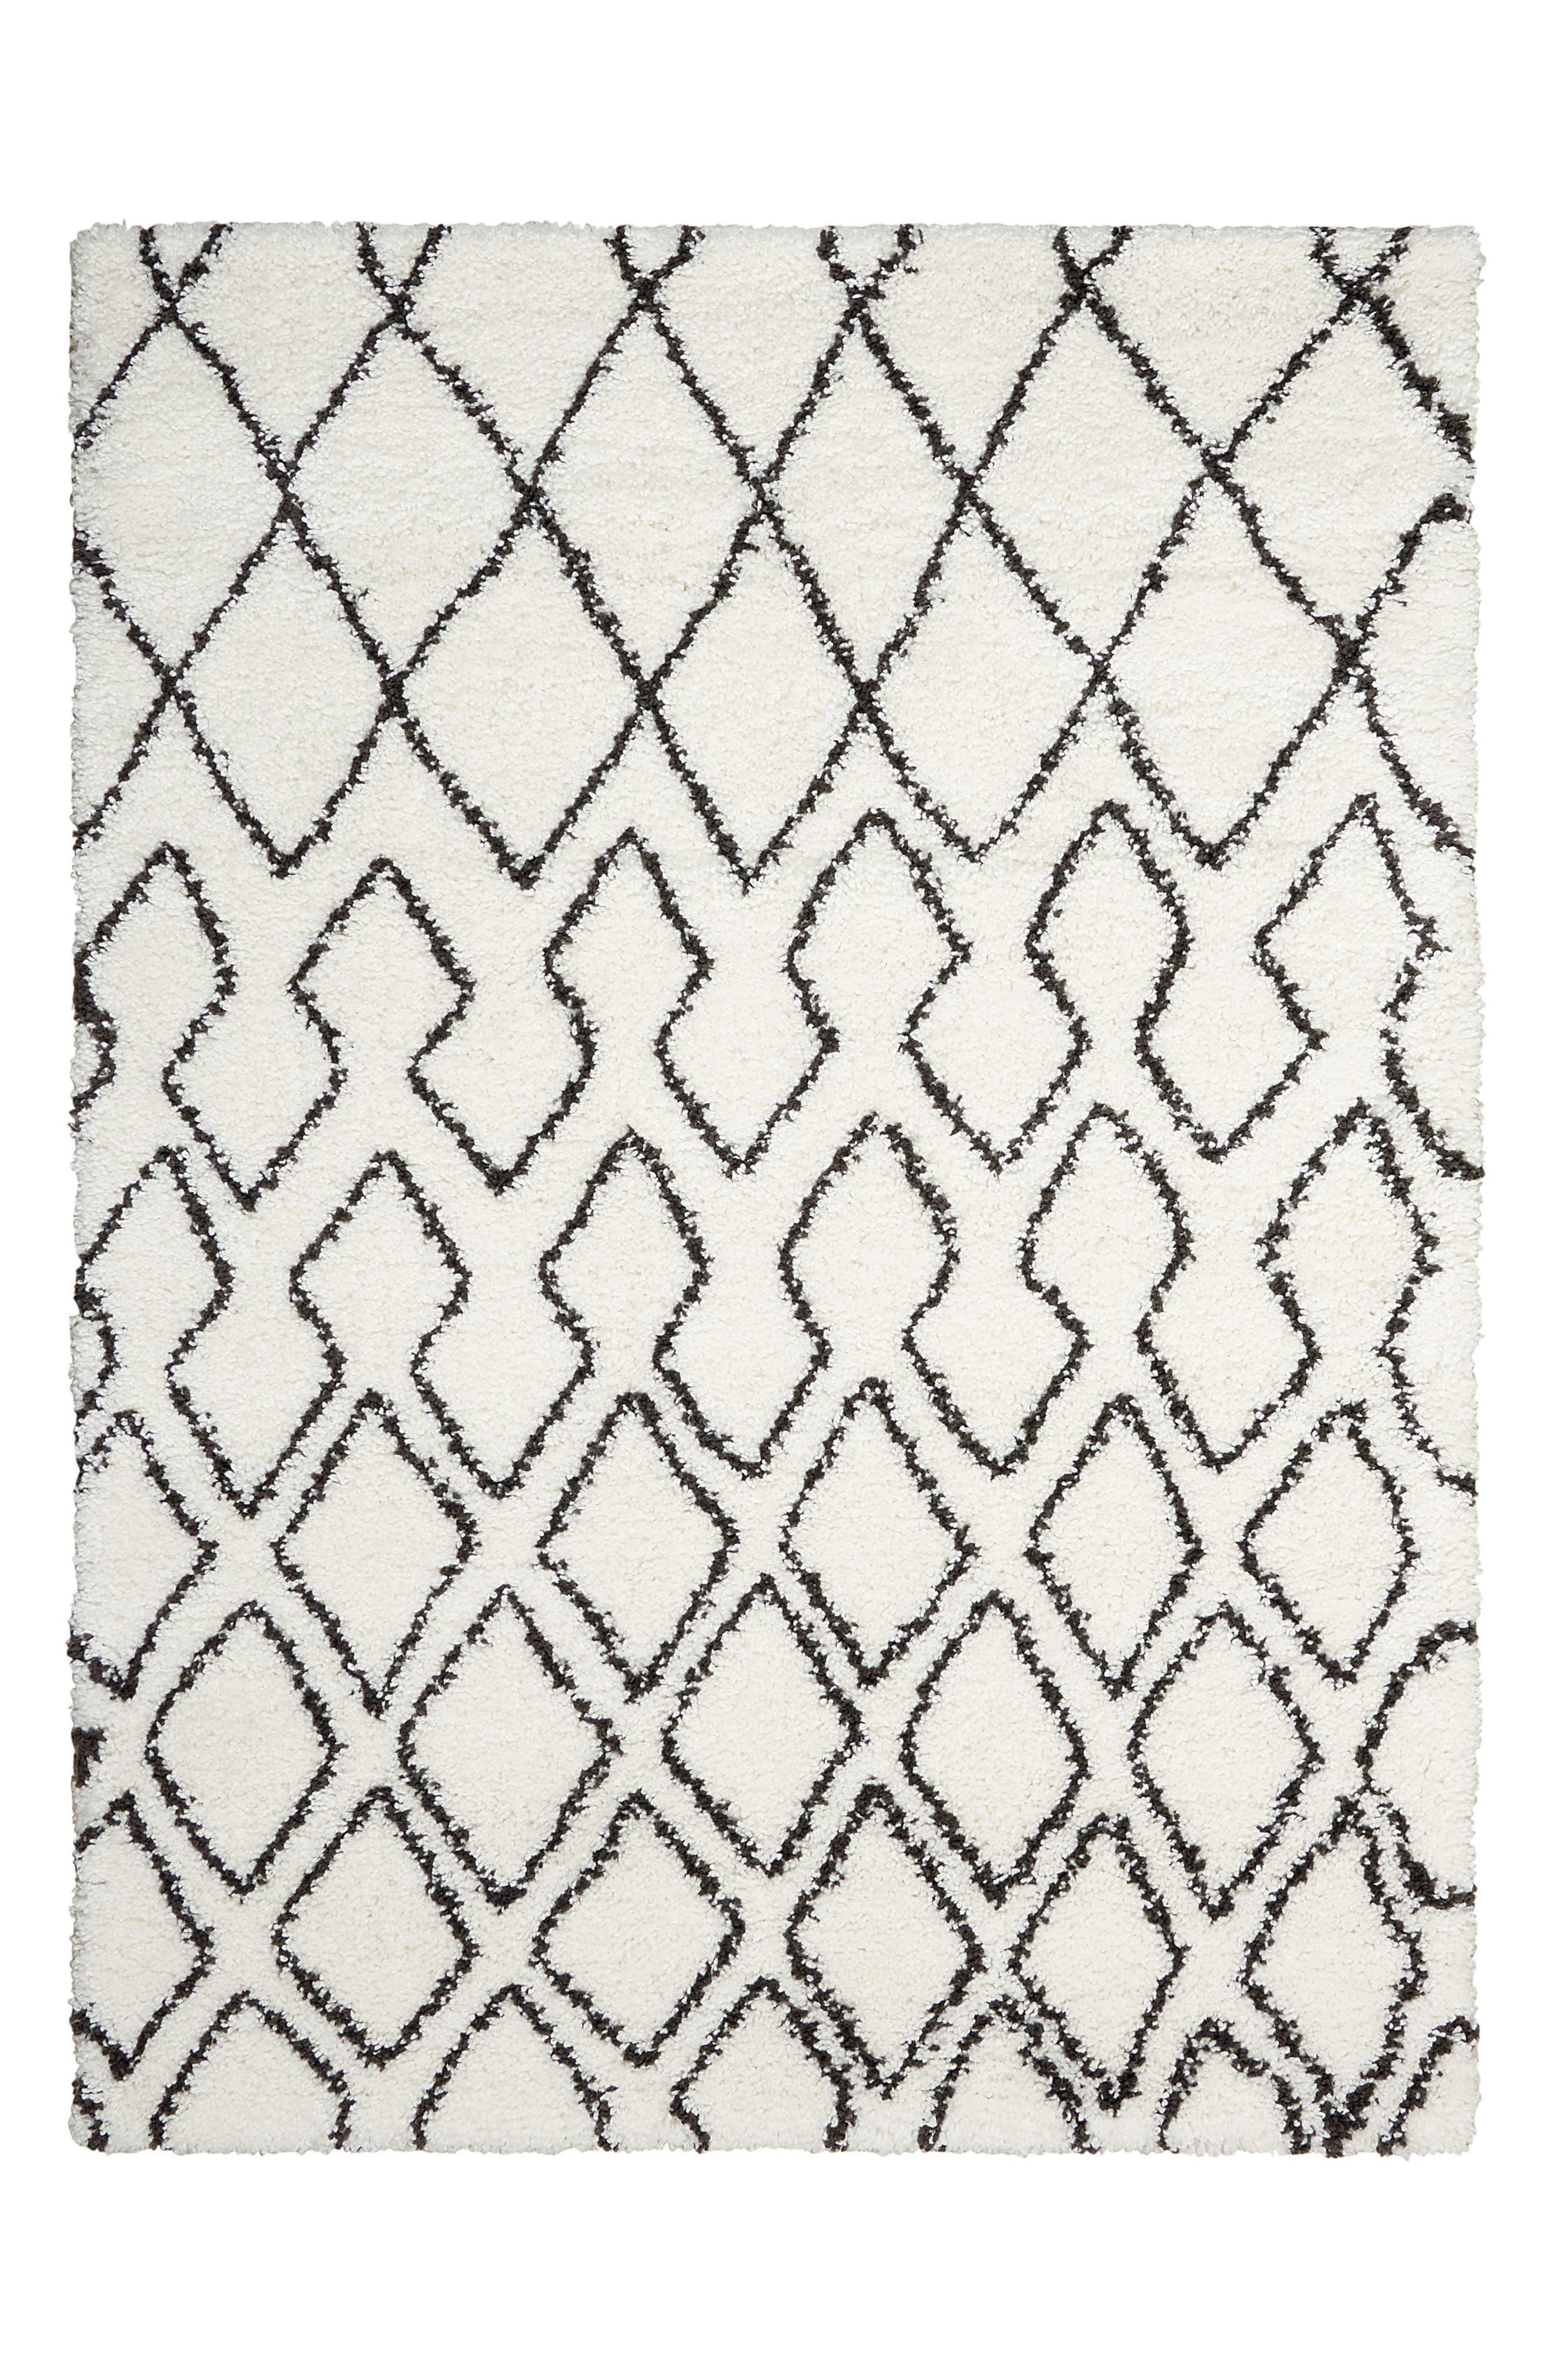 Riad Shag Area Rug,                         Main,                         color, Ivory/ Charcoal